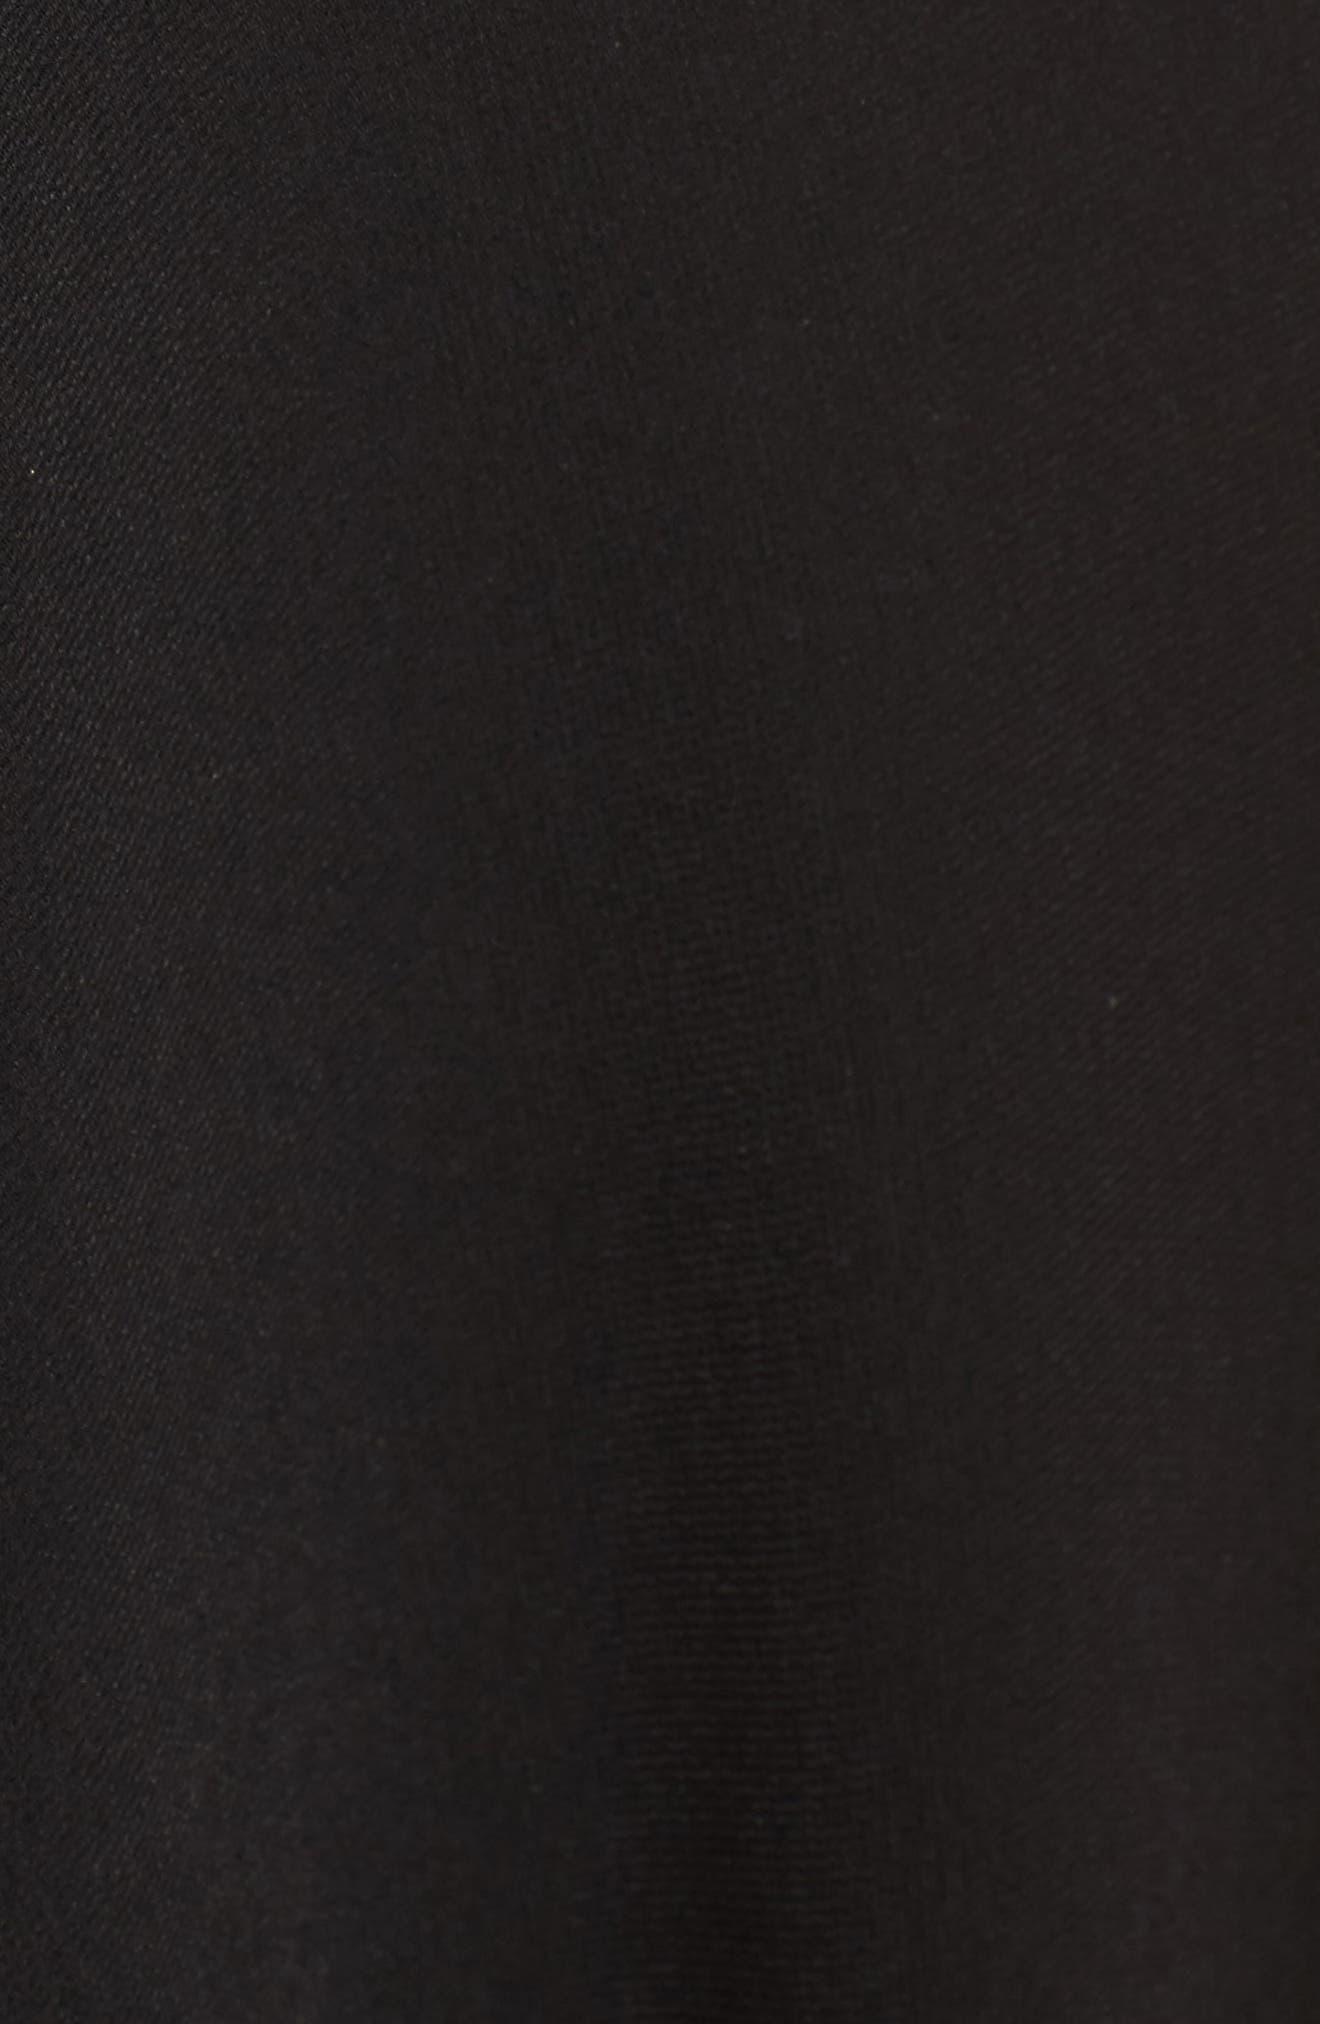 Kerry Maxi Dress,                             Alternate thumbnail 5, color,                             001